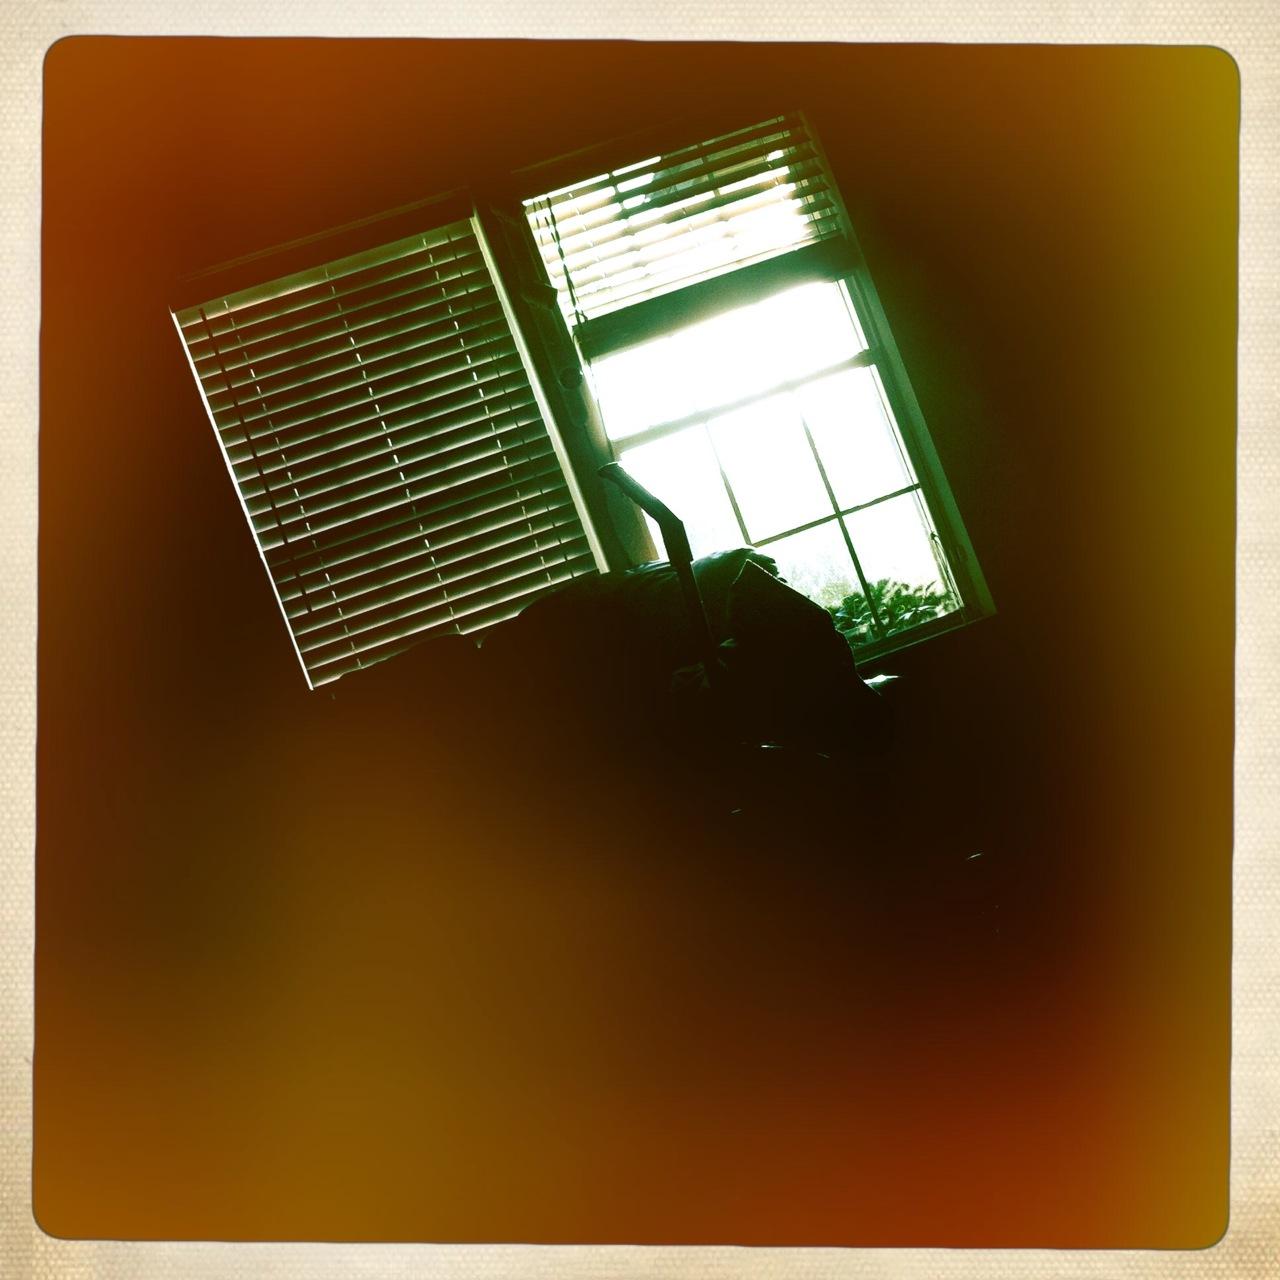 Sunrise through the window 2 John S Lens, Ina's 1969 Film, Cherry Shine Flash,